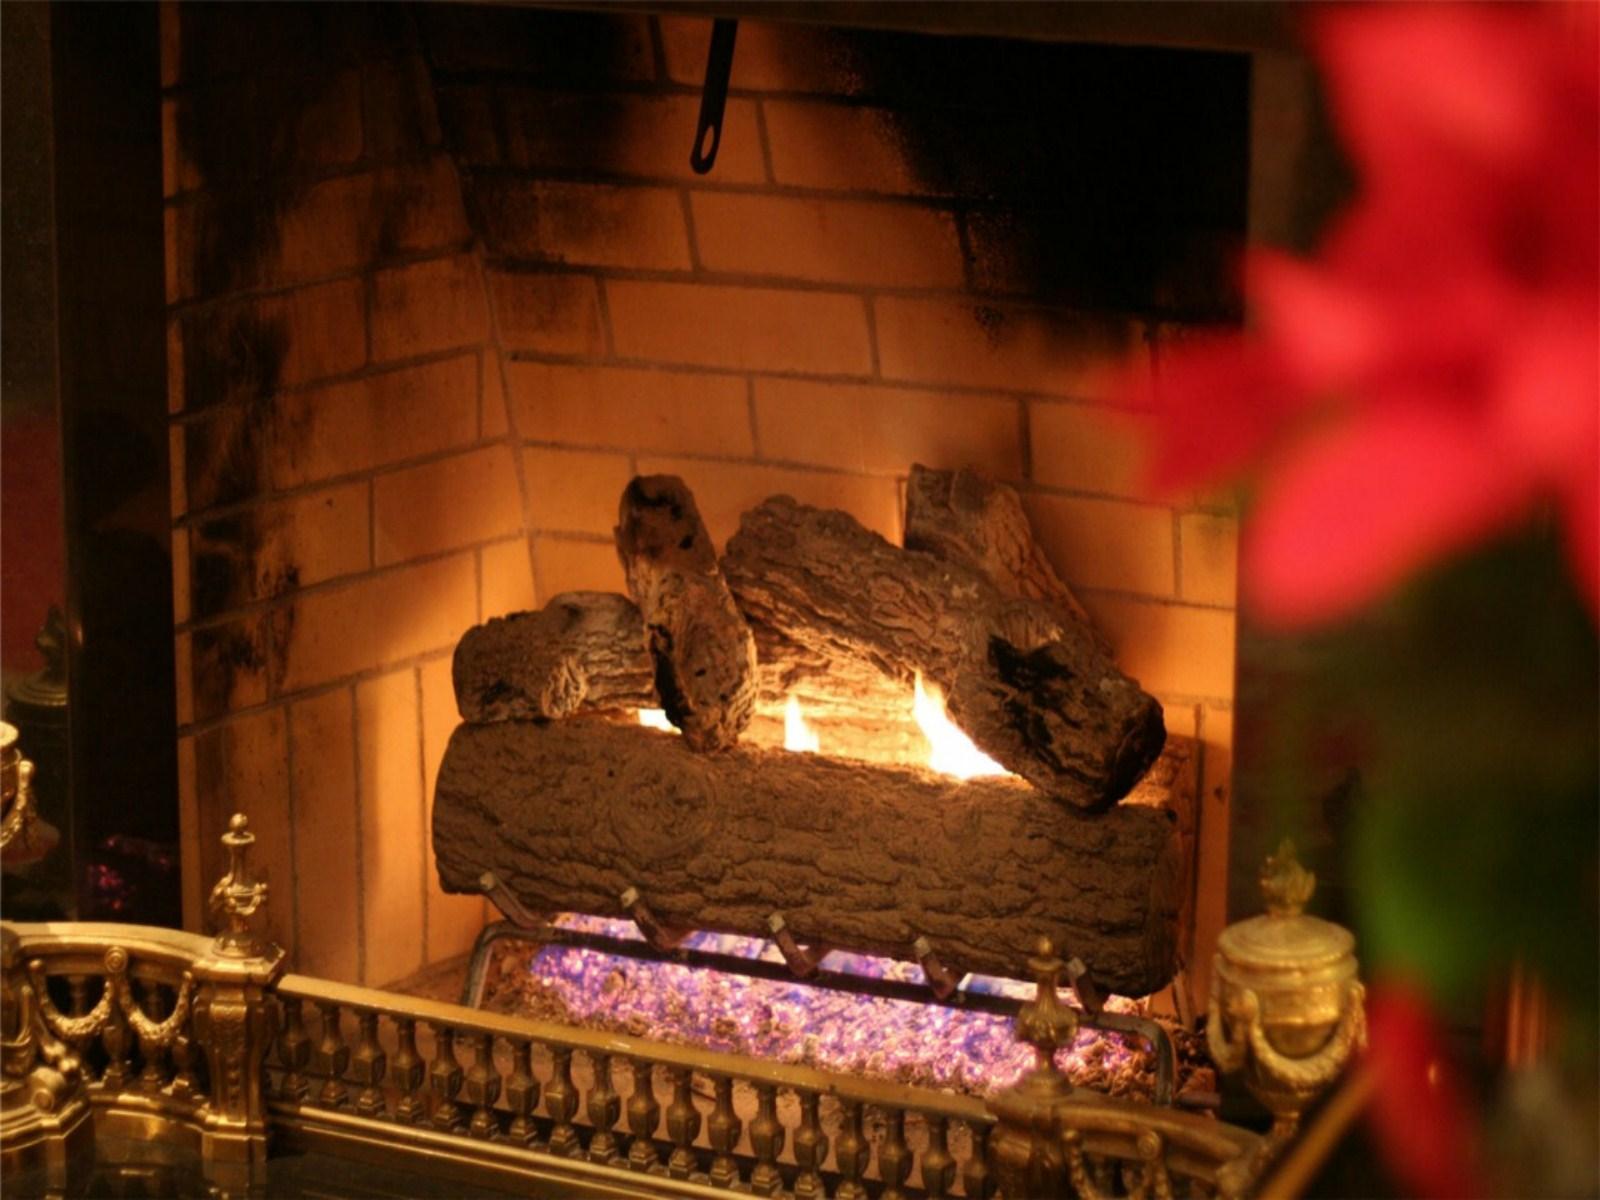 URL httpmi9comhome fireplace free desktop wallpaper 81873html 1600x1200